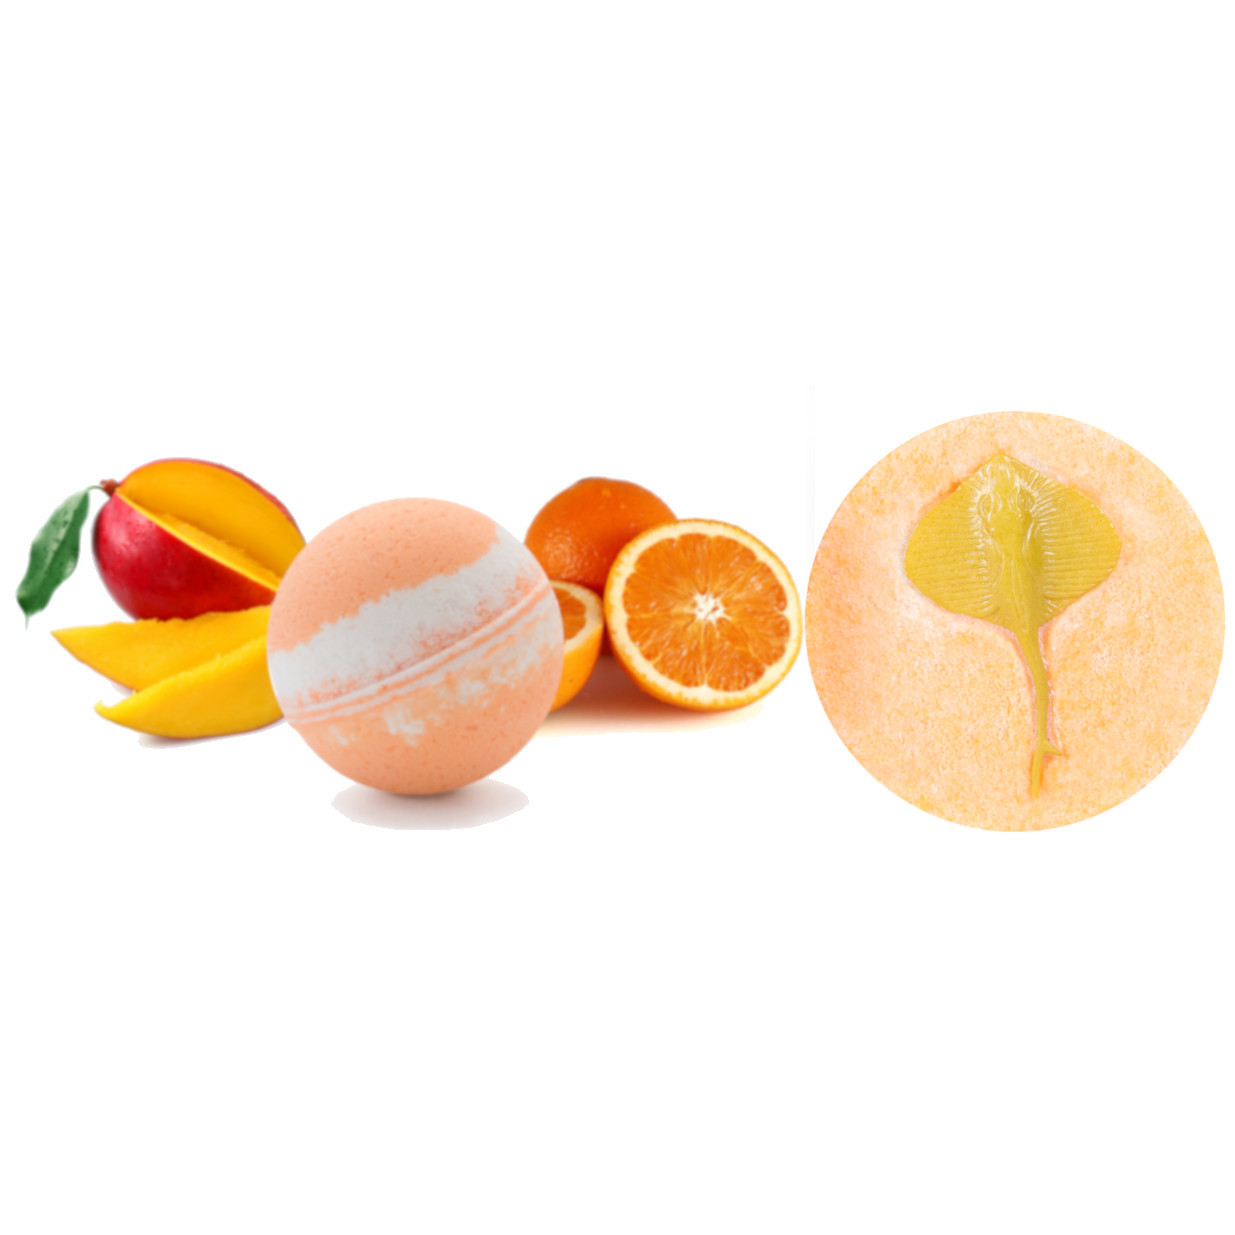 mango-papaya-stingray-square